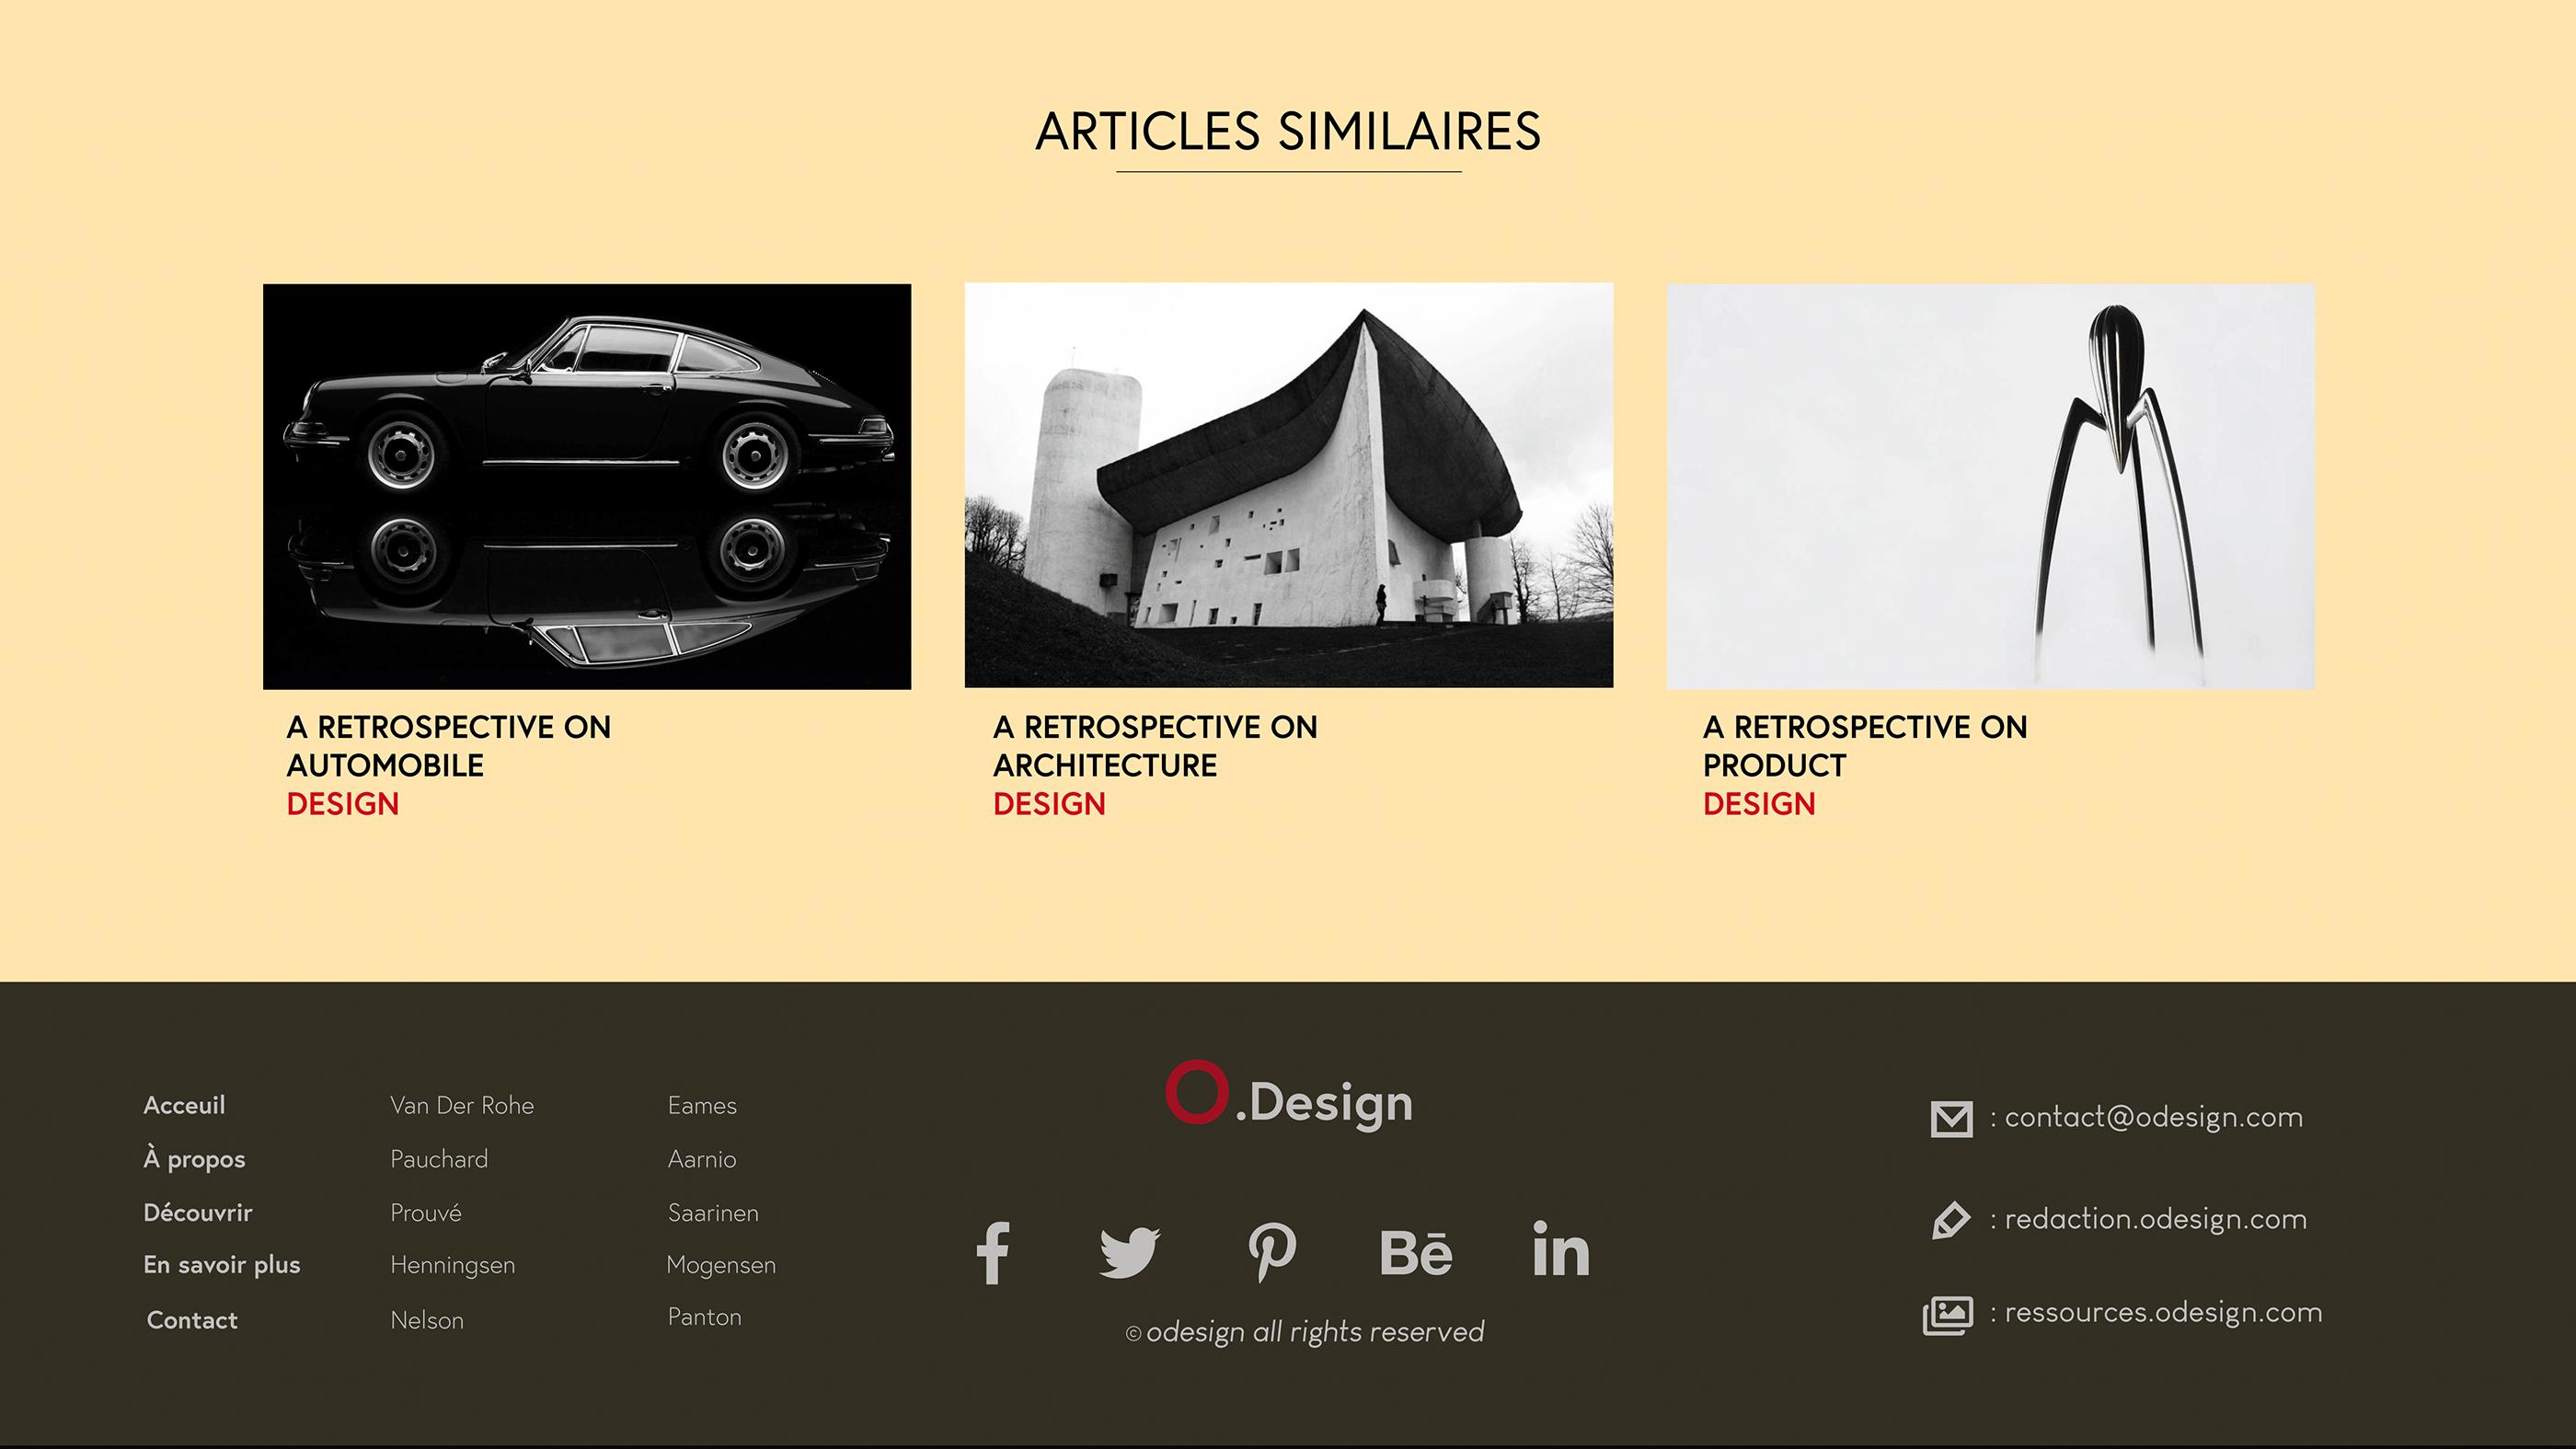 O.Design webdesign on Behance